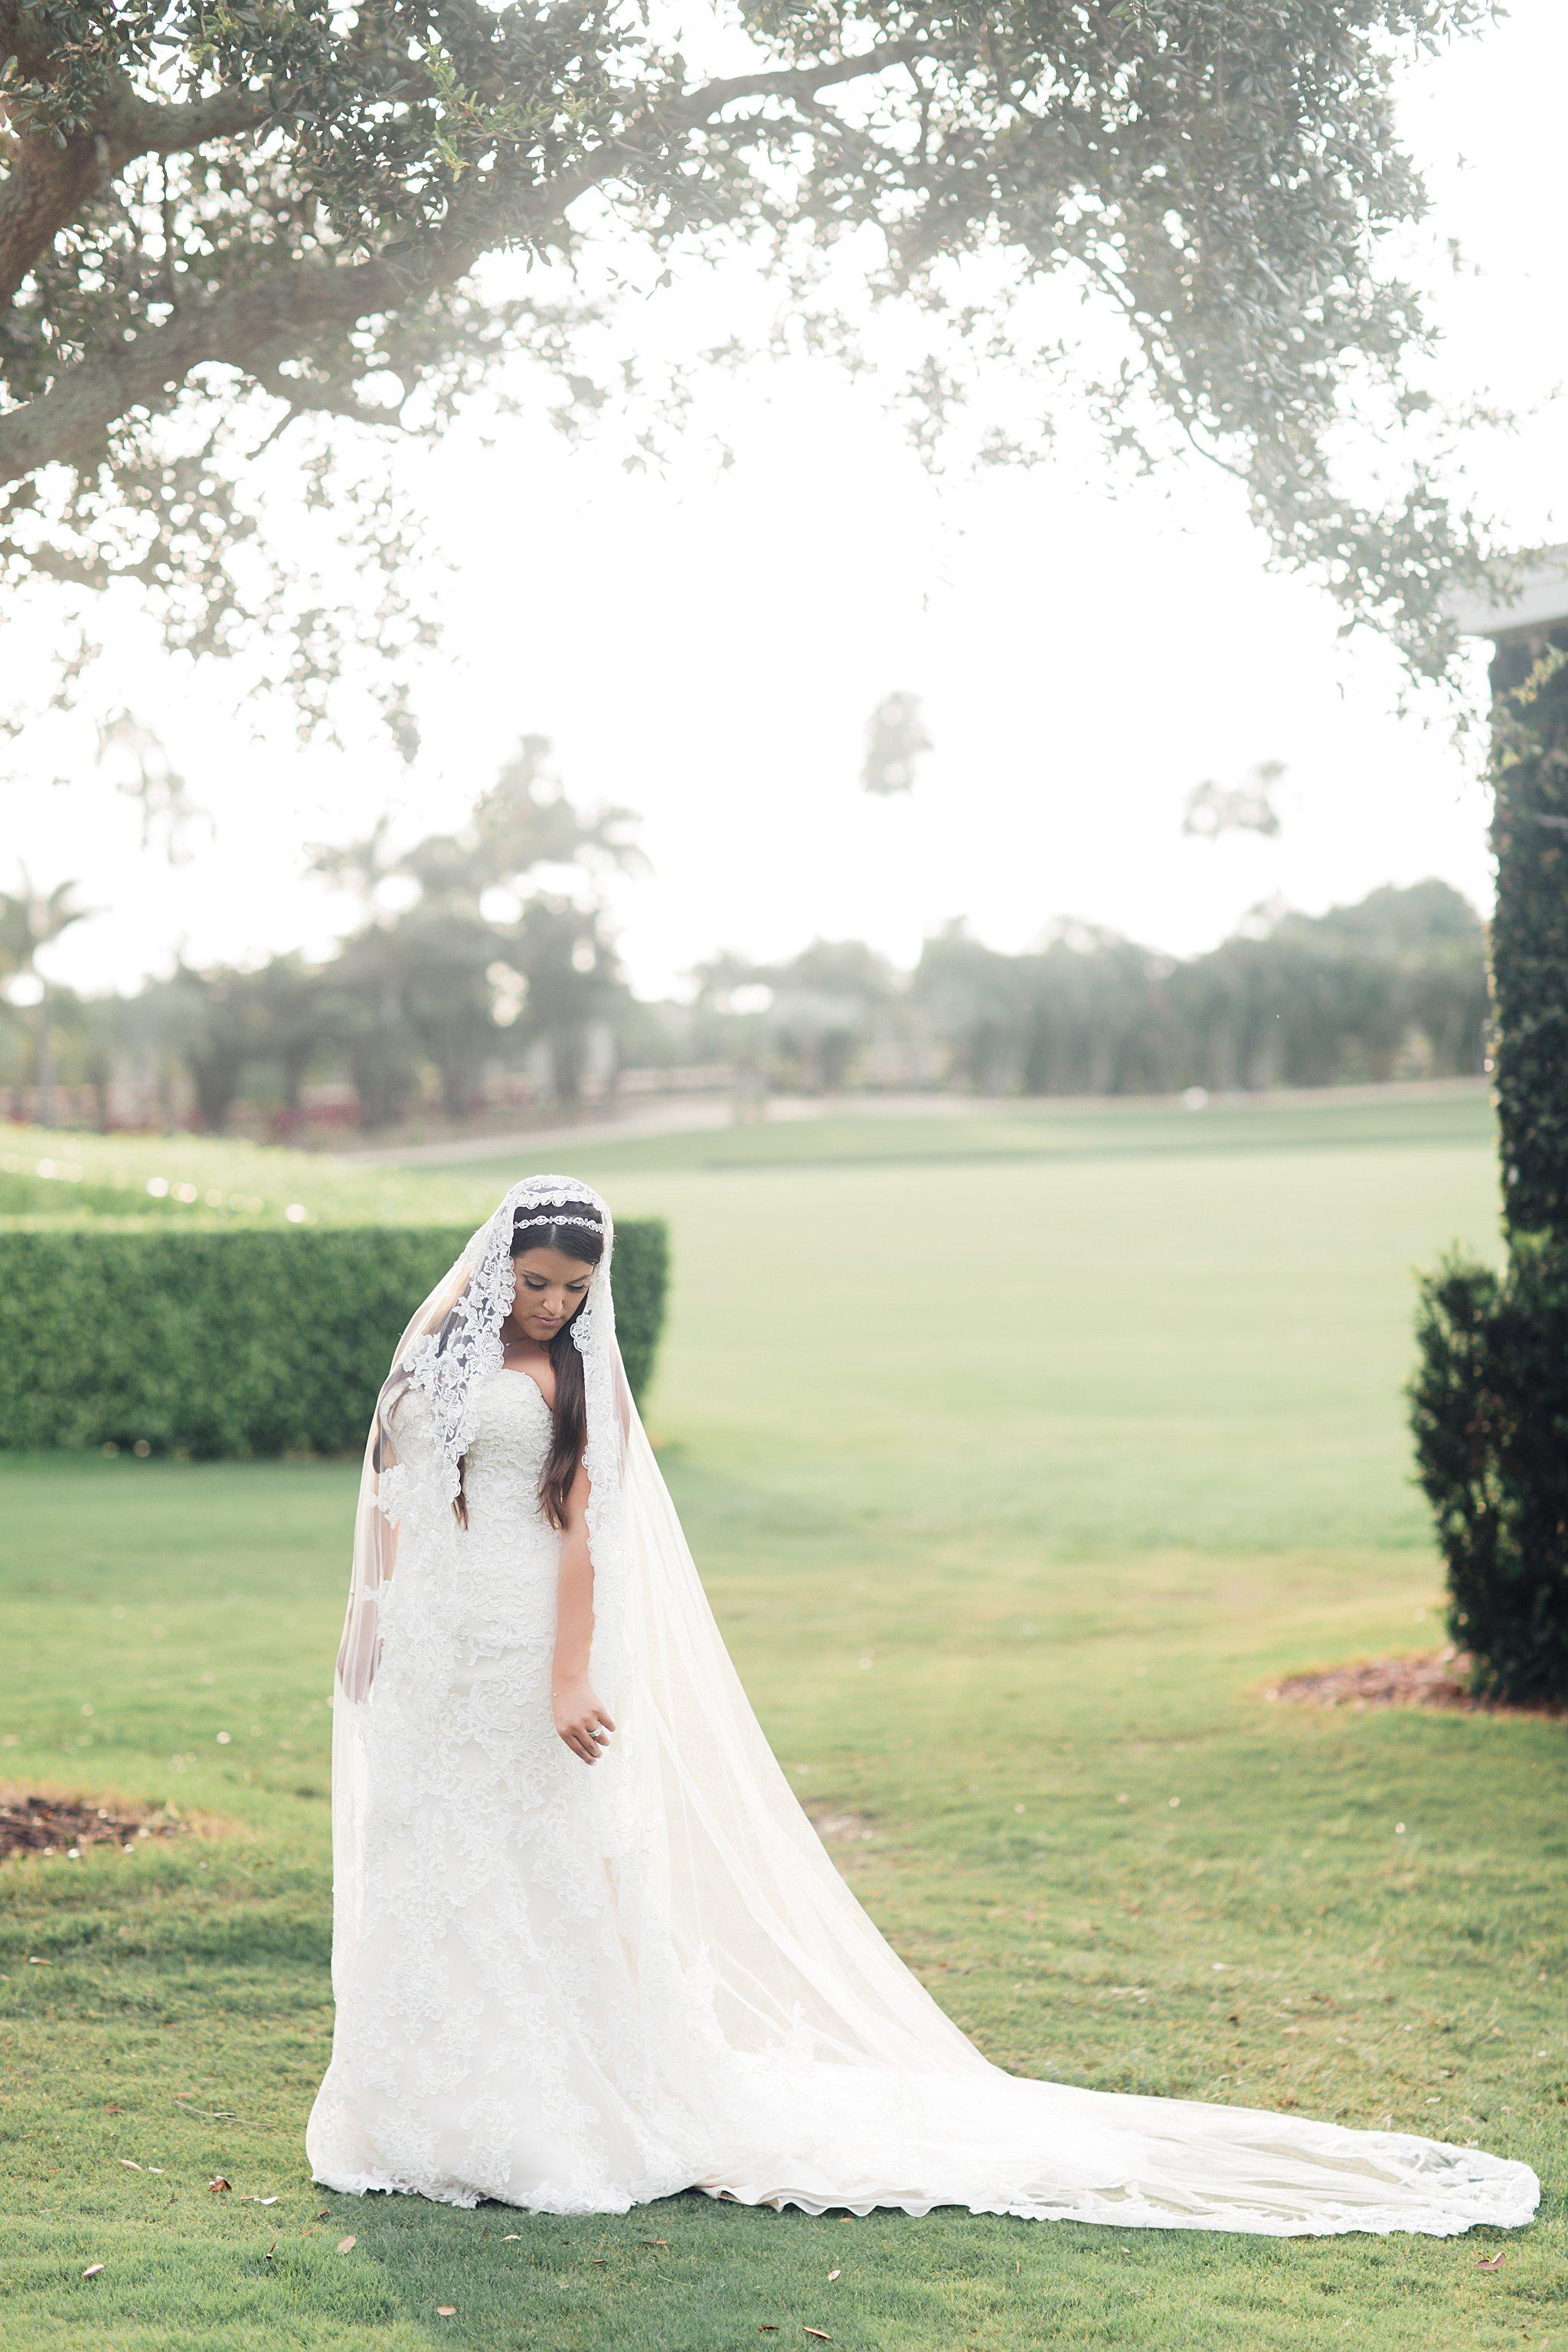 WeddingandEngagementFloridaPhotographer_2811.jpg